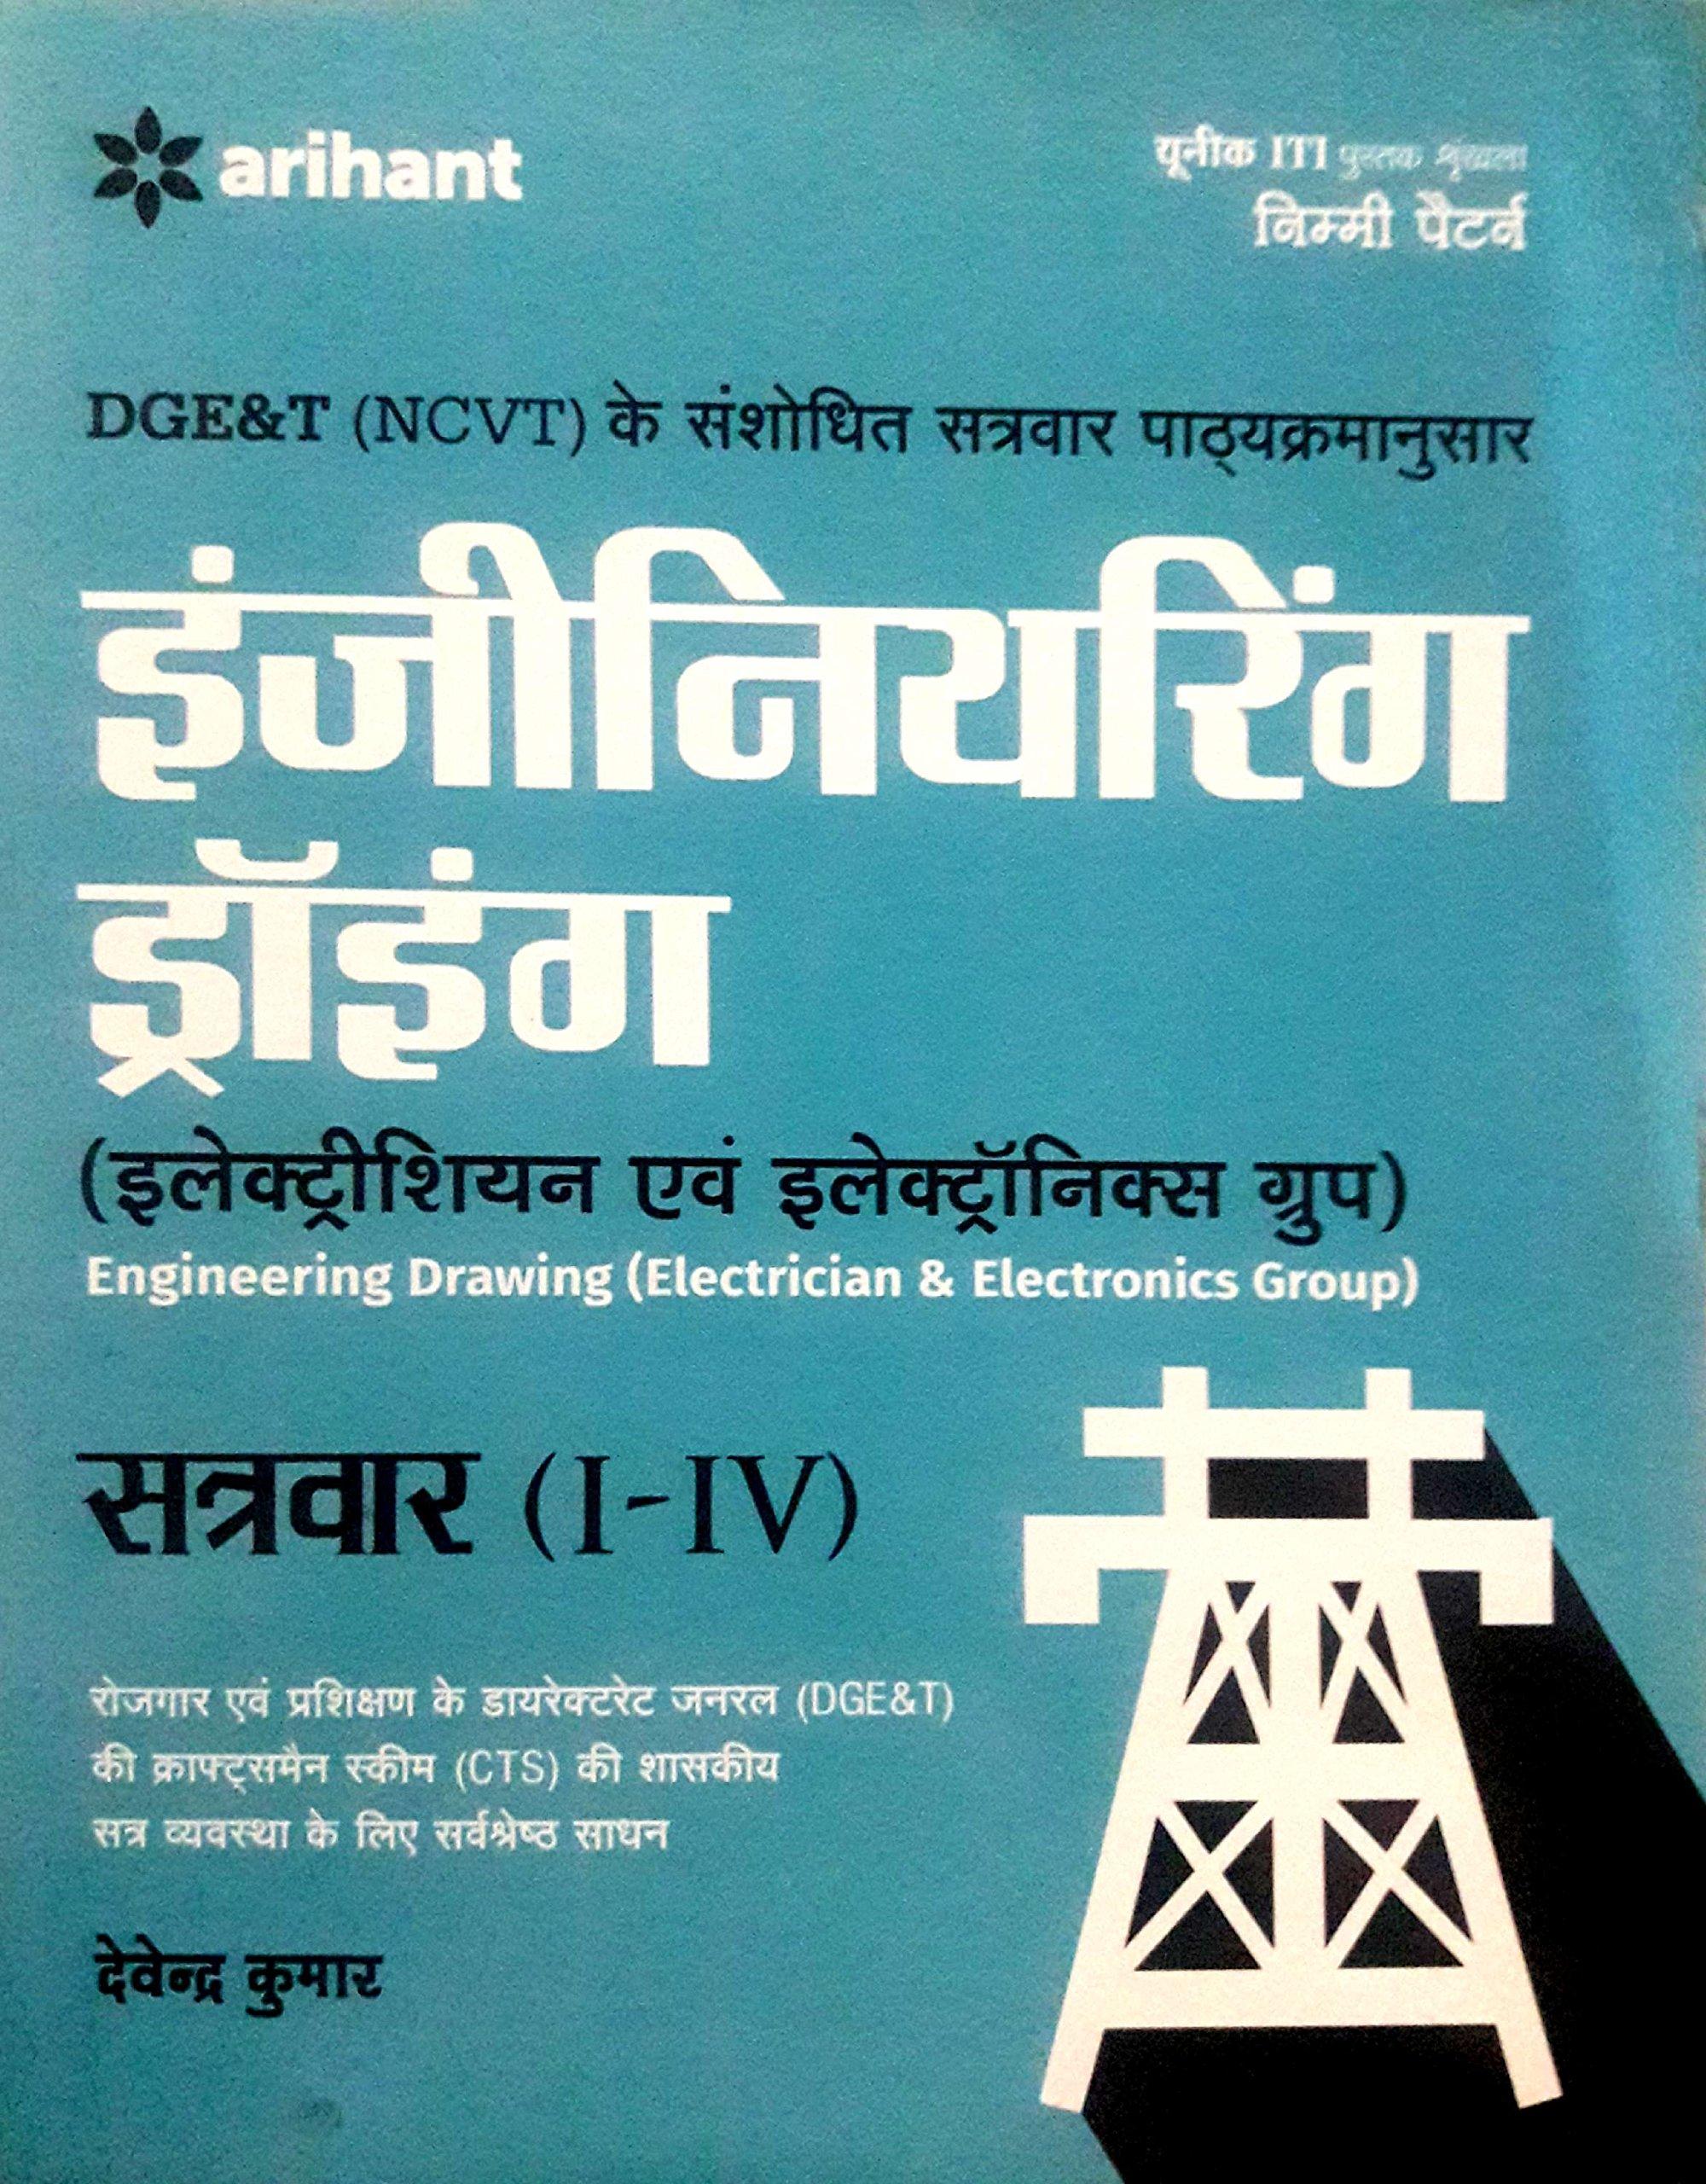 Buy Arihant Engineering Drawing Electrician Iti Book Based On Nimmi